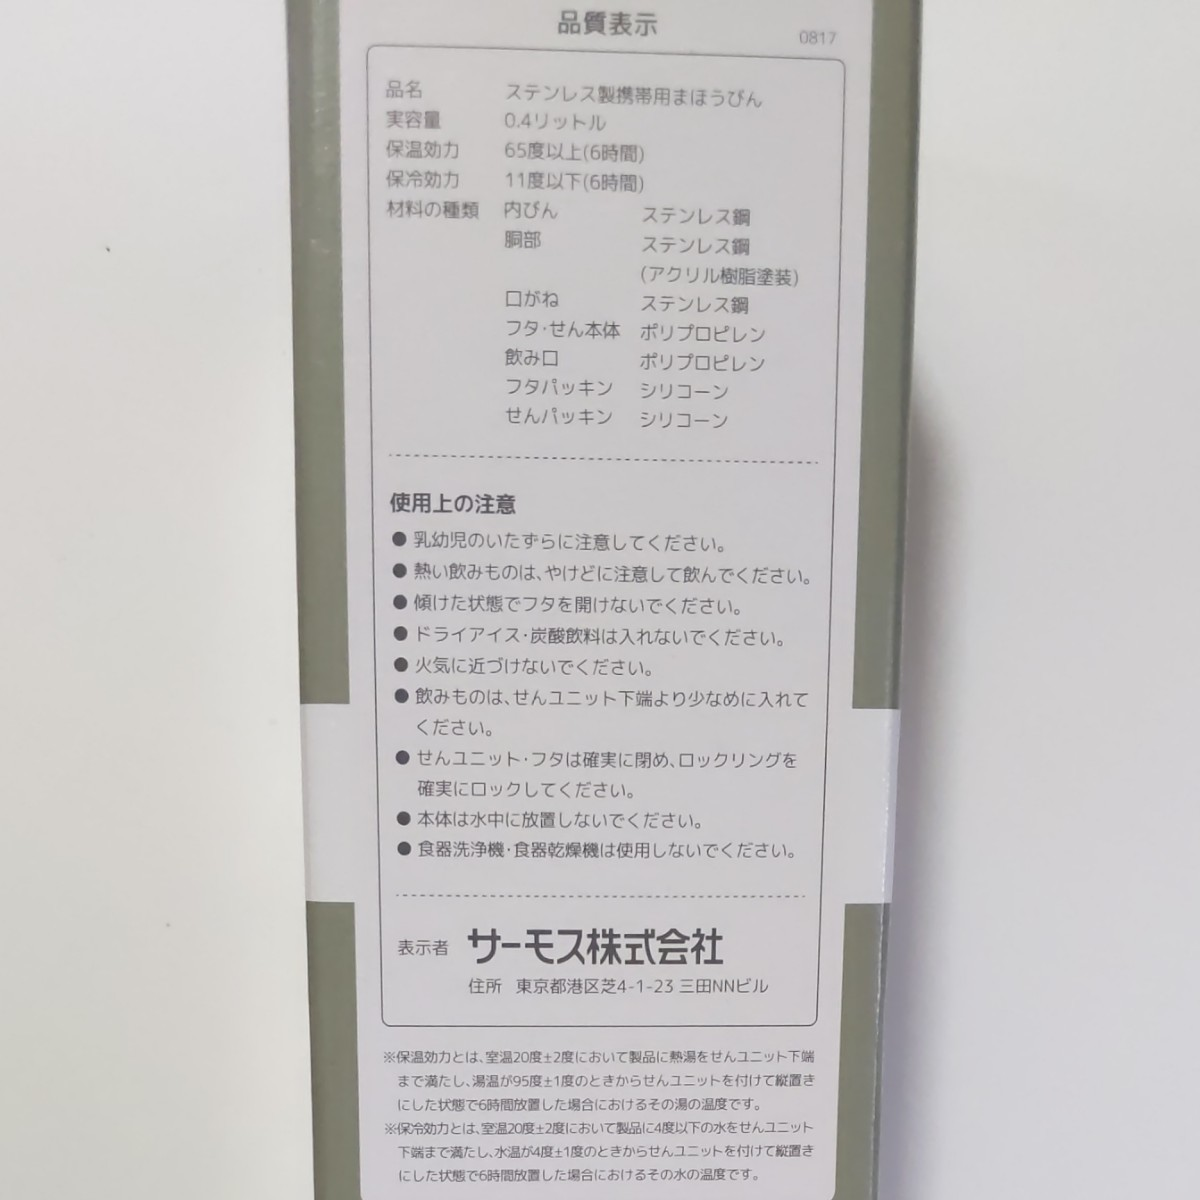 THERMOS サーモス 真空断熱 ケータイマグ 0.4L ステンレスボトル 水筒